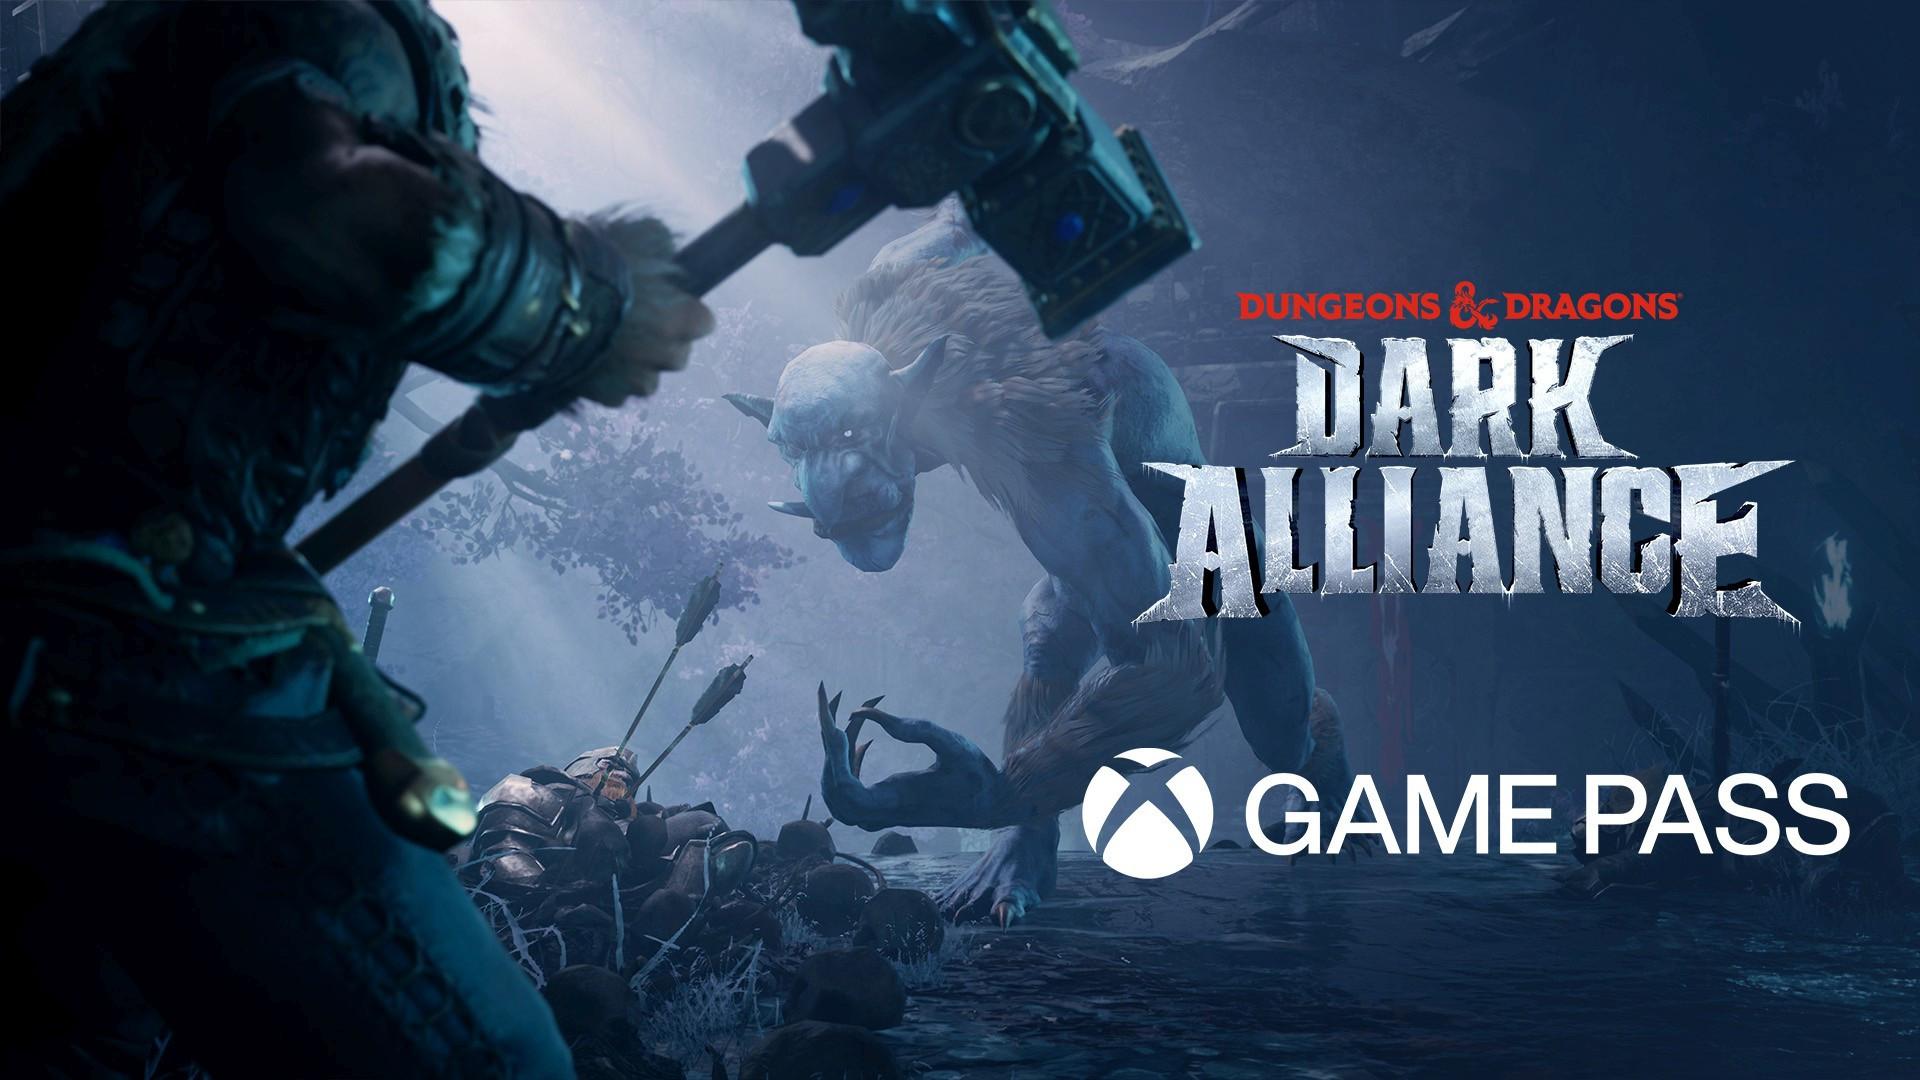 Dungeons & Dragons Dark Alliance komt naar Gamepass op Day One!